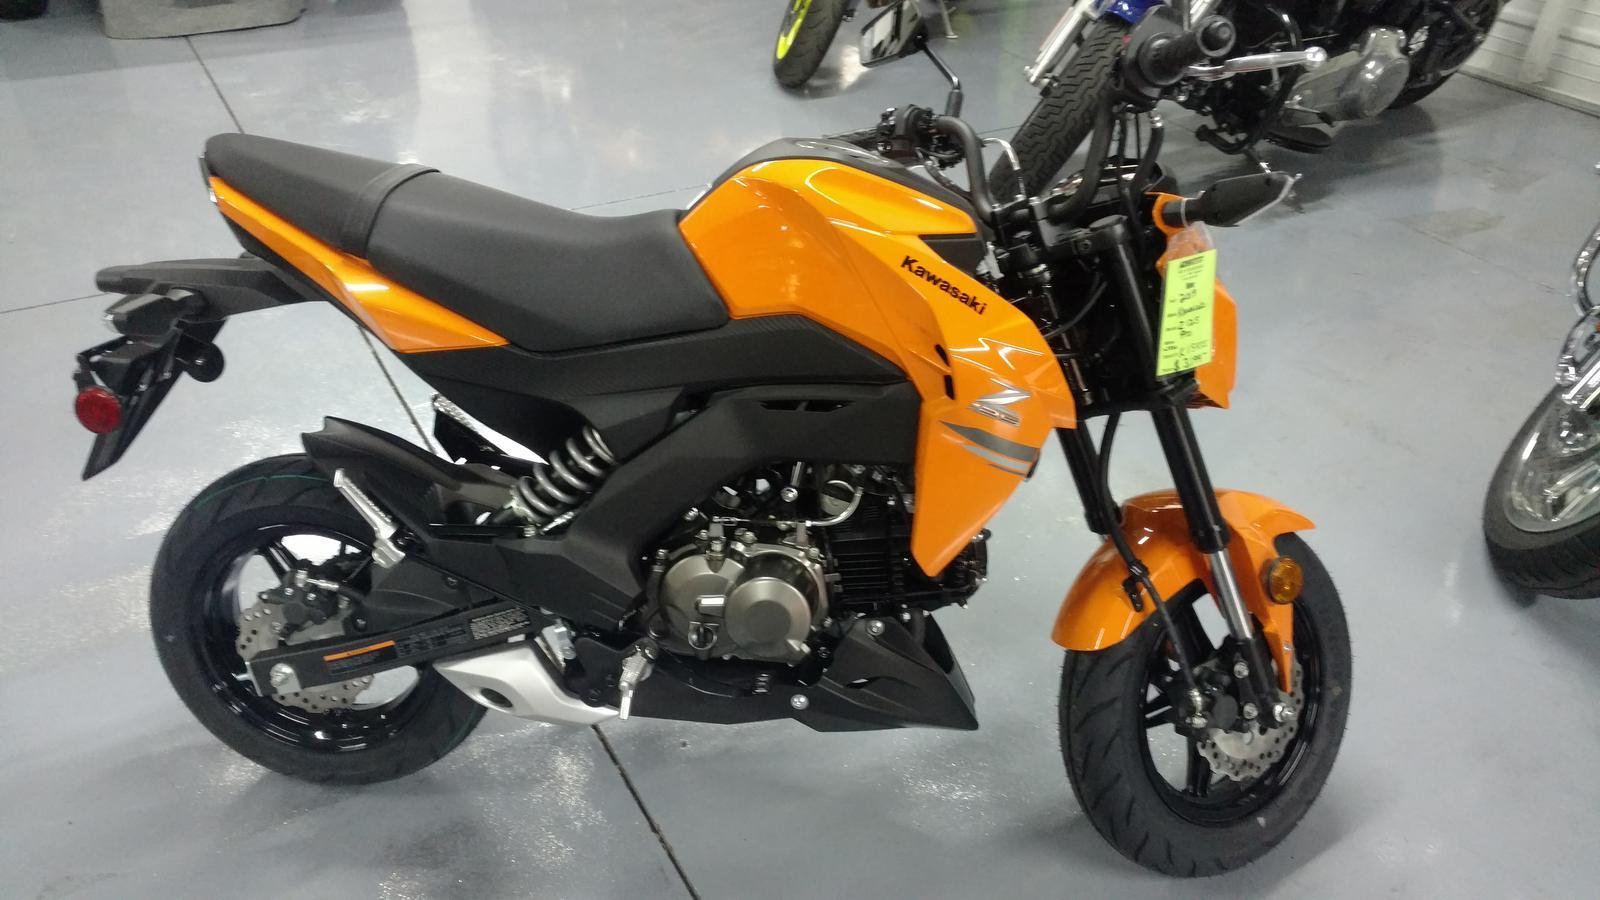 2019 Kawasaki Z125 Pro For Sale In Tucson Az Azkkt Inc Tucson